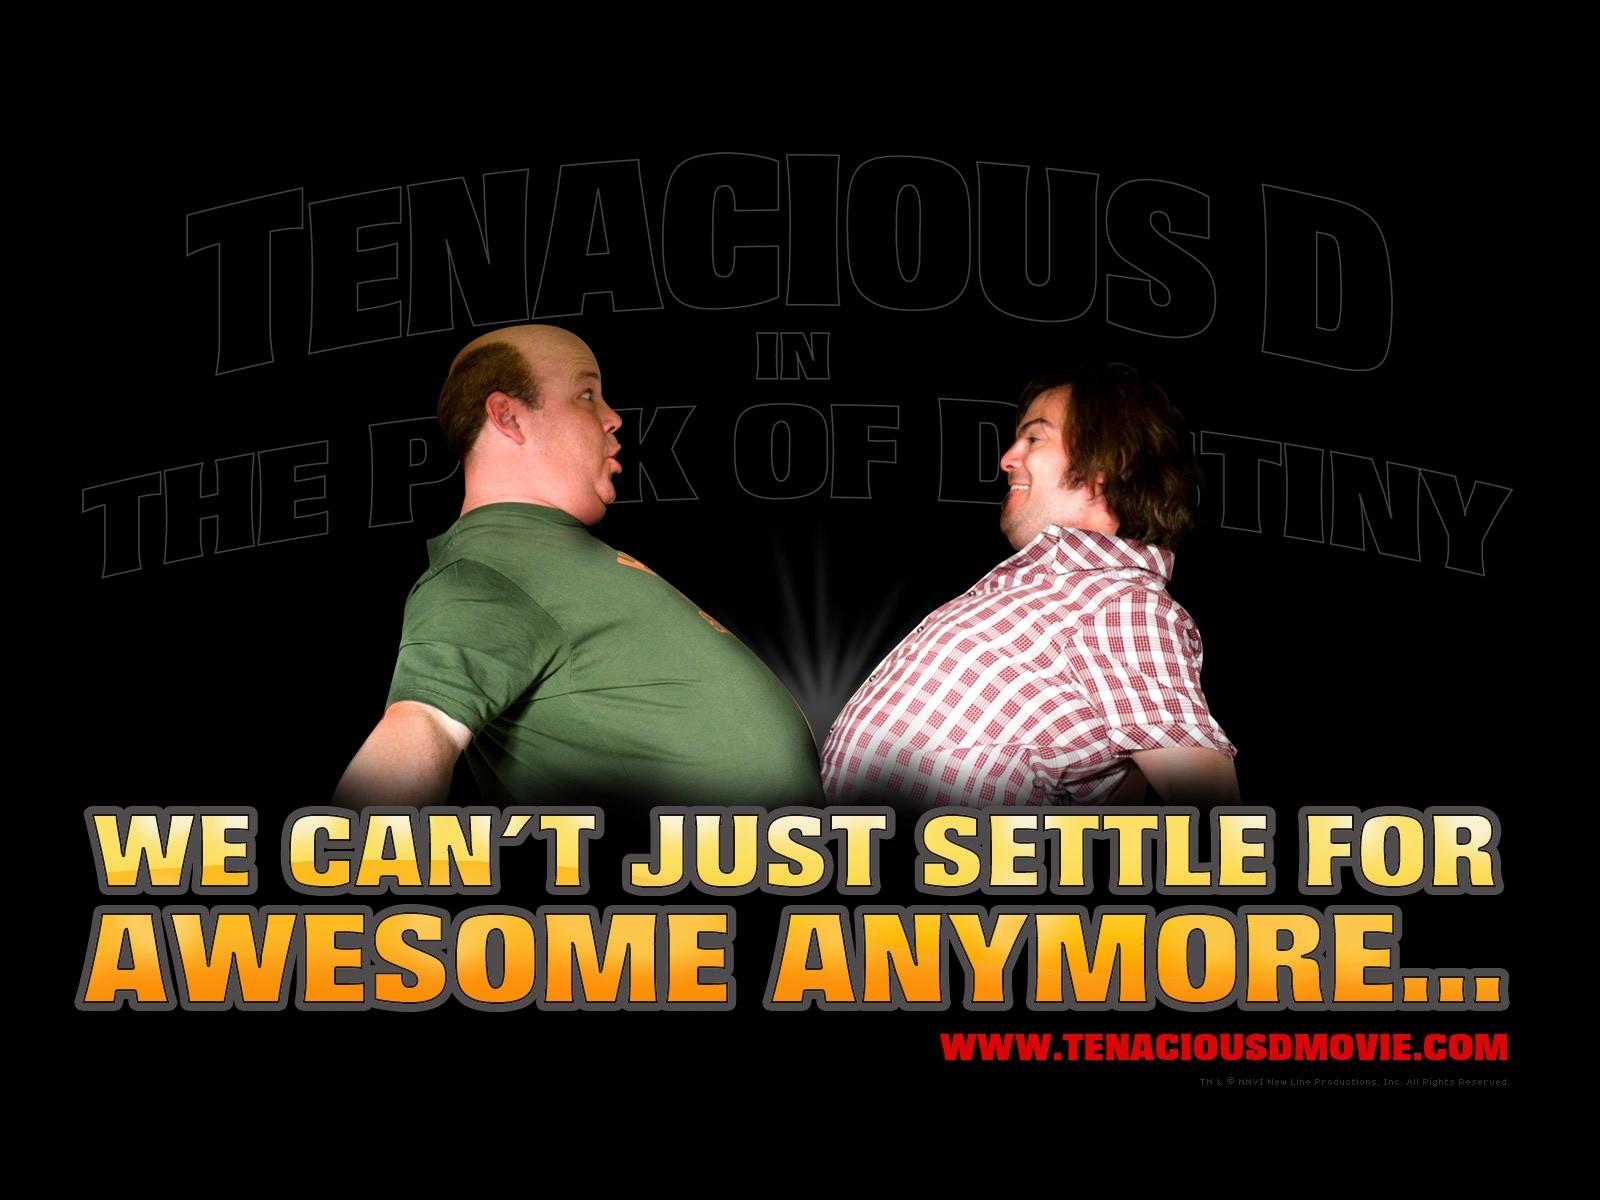 Wallpaper del film Tenacious D e il destino del rock